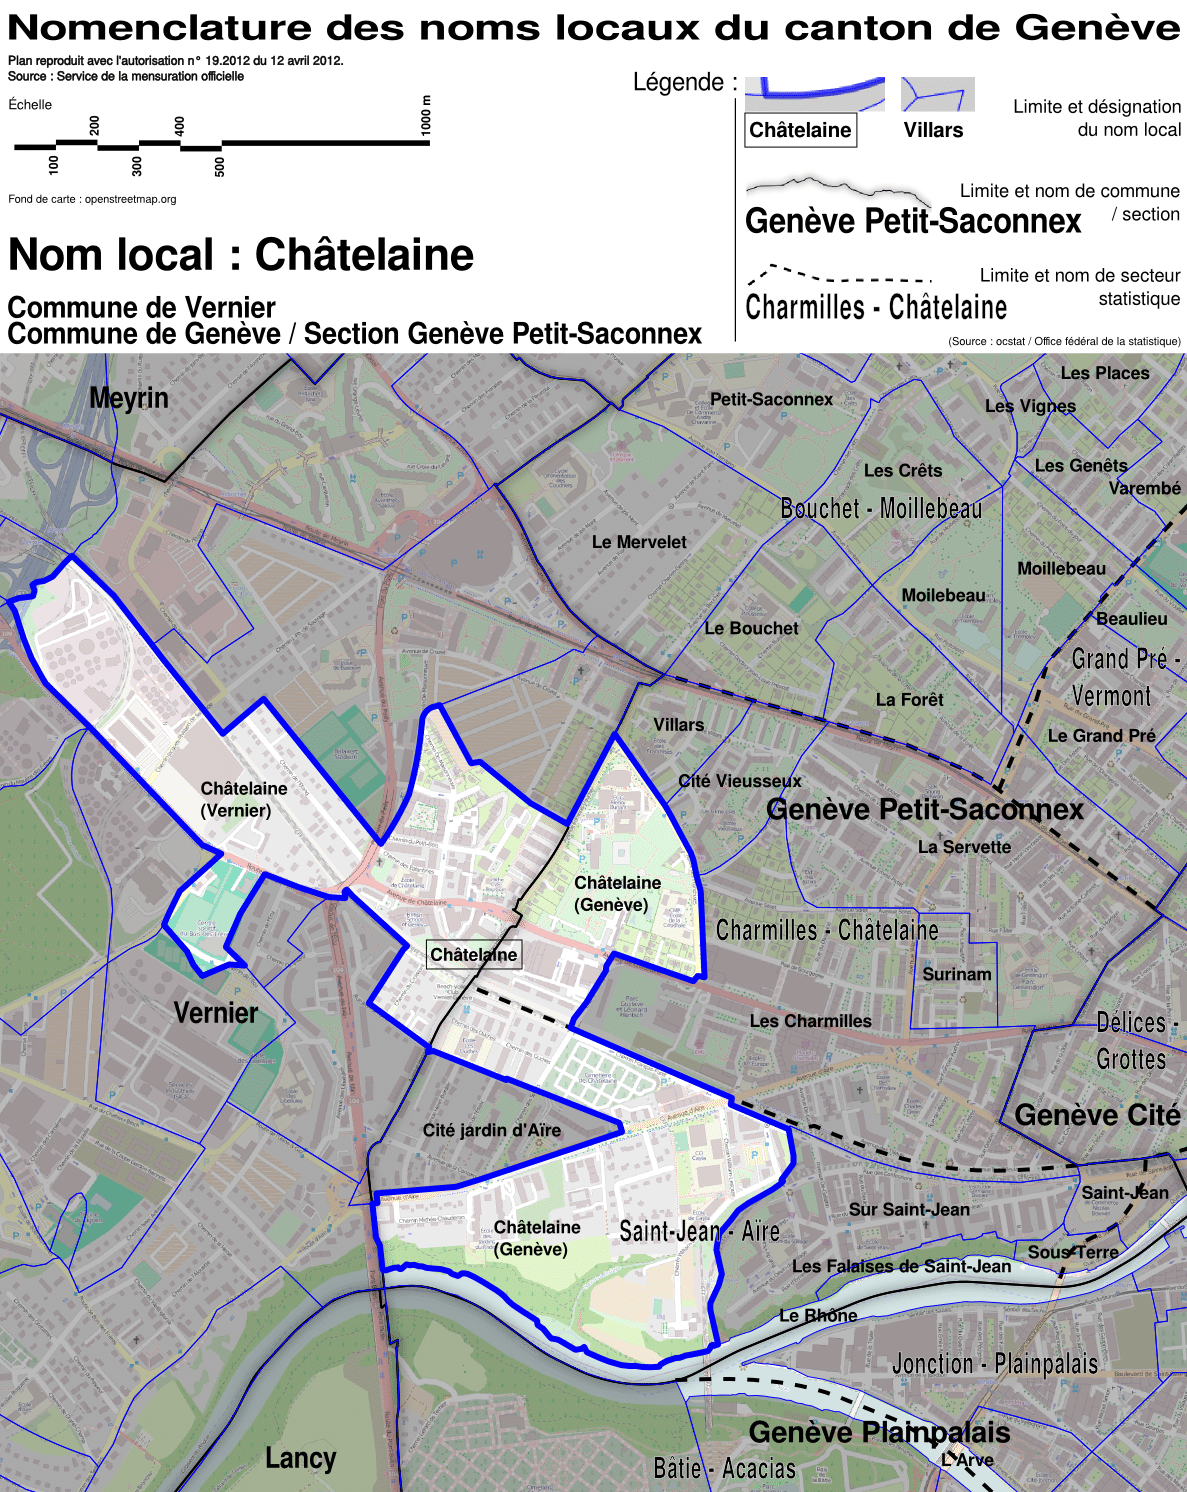 Chatelaine